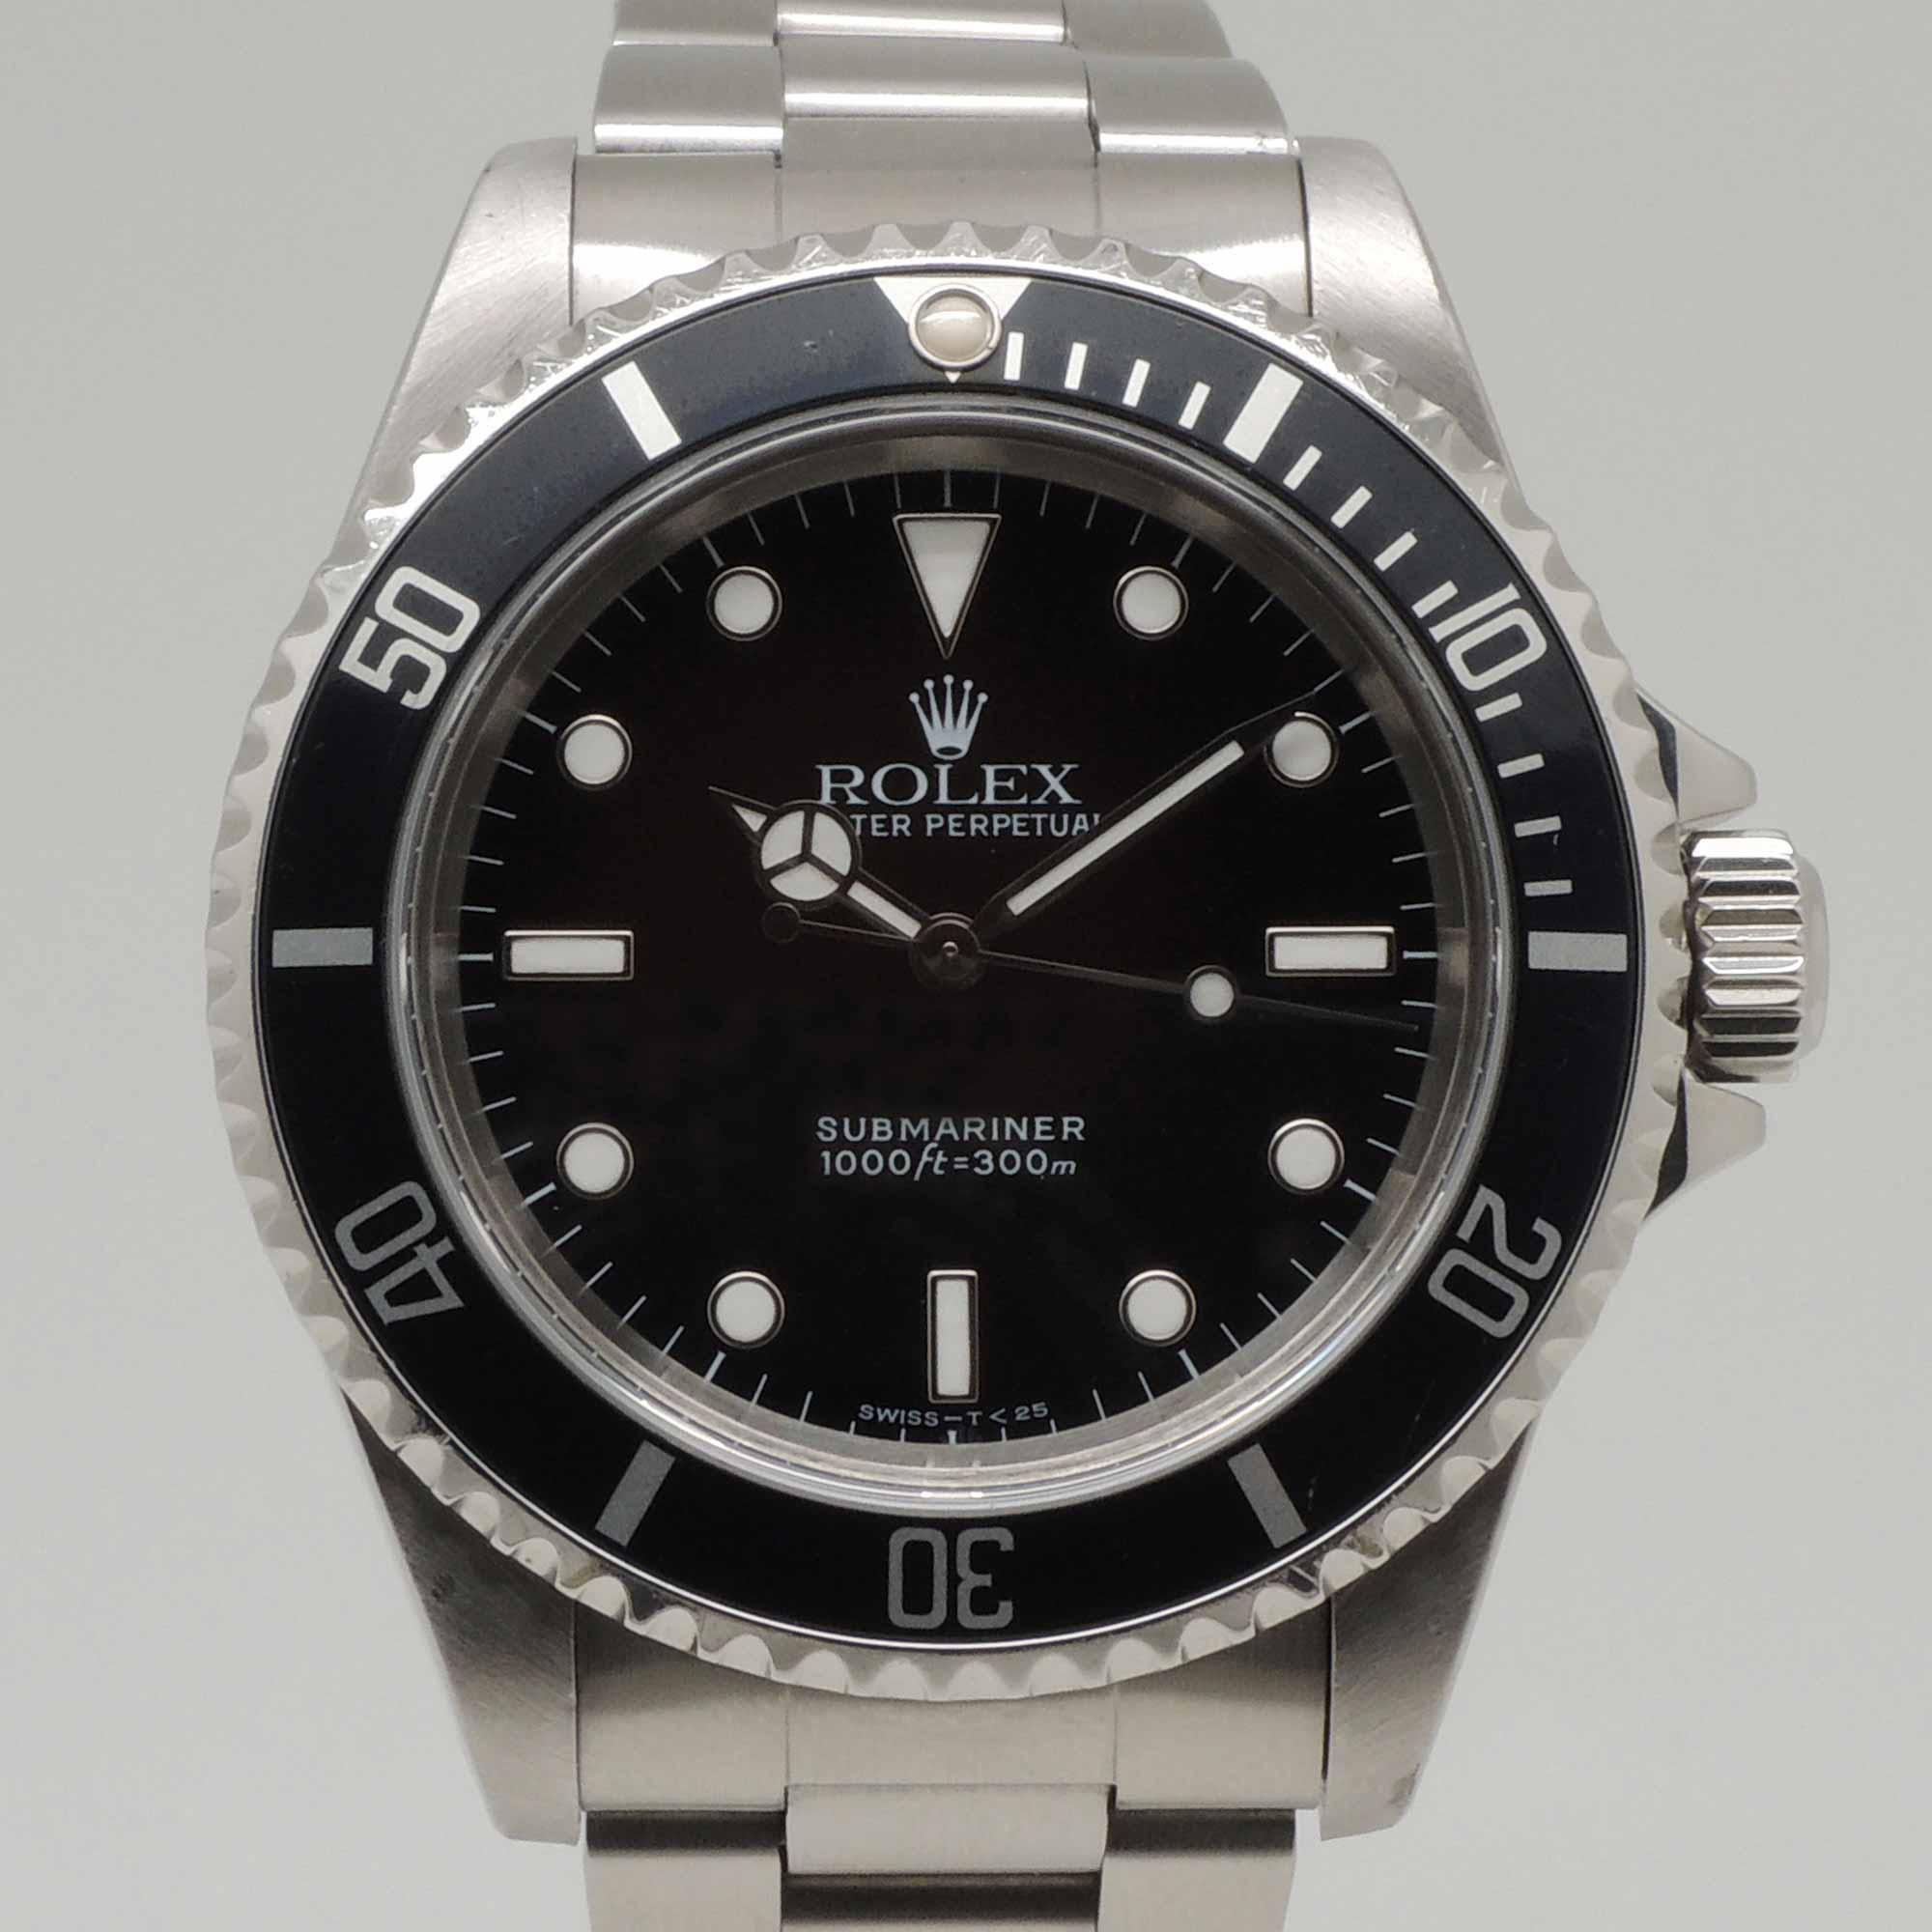 Ancienne  Compra Venta de Relojes. Rolex Submariner 14060 01476 5ef15dfd6658